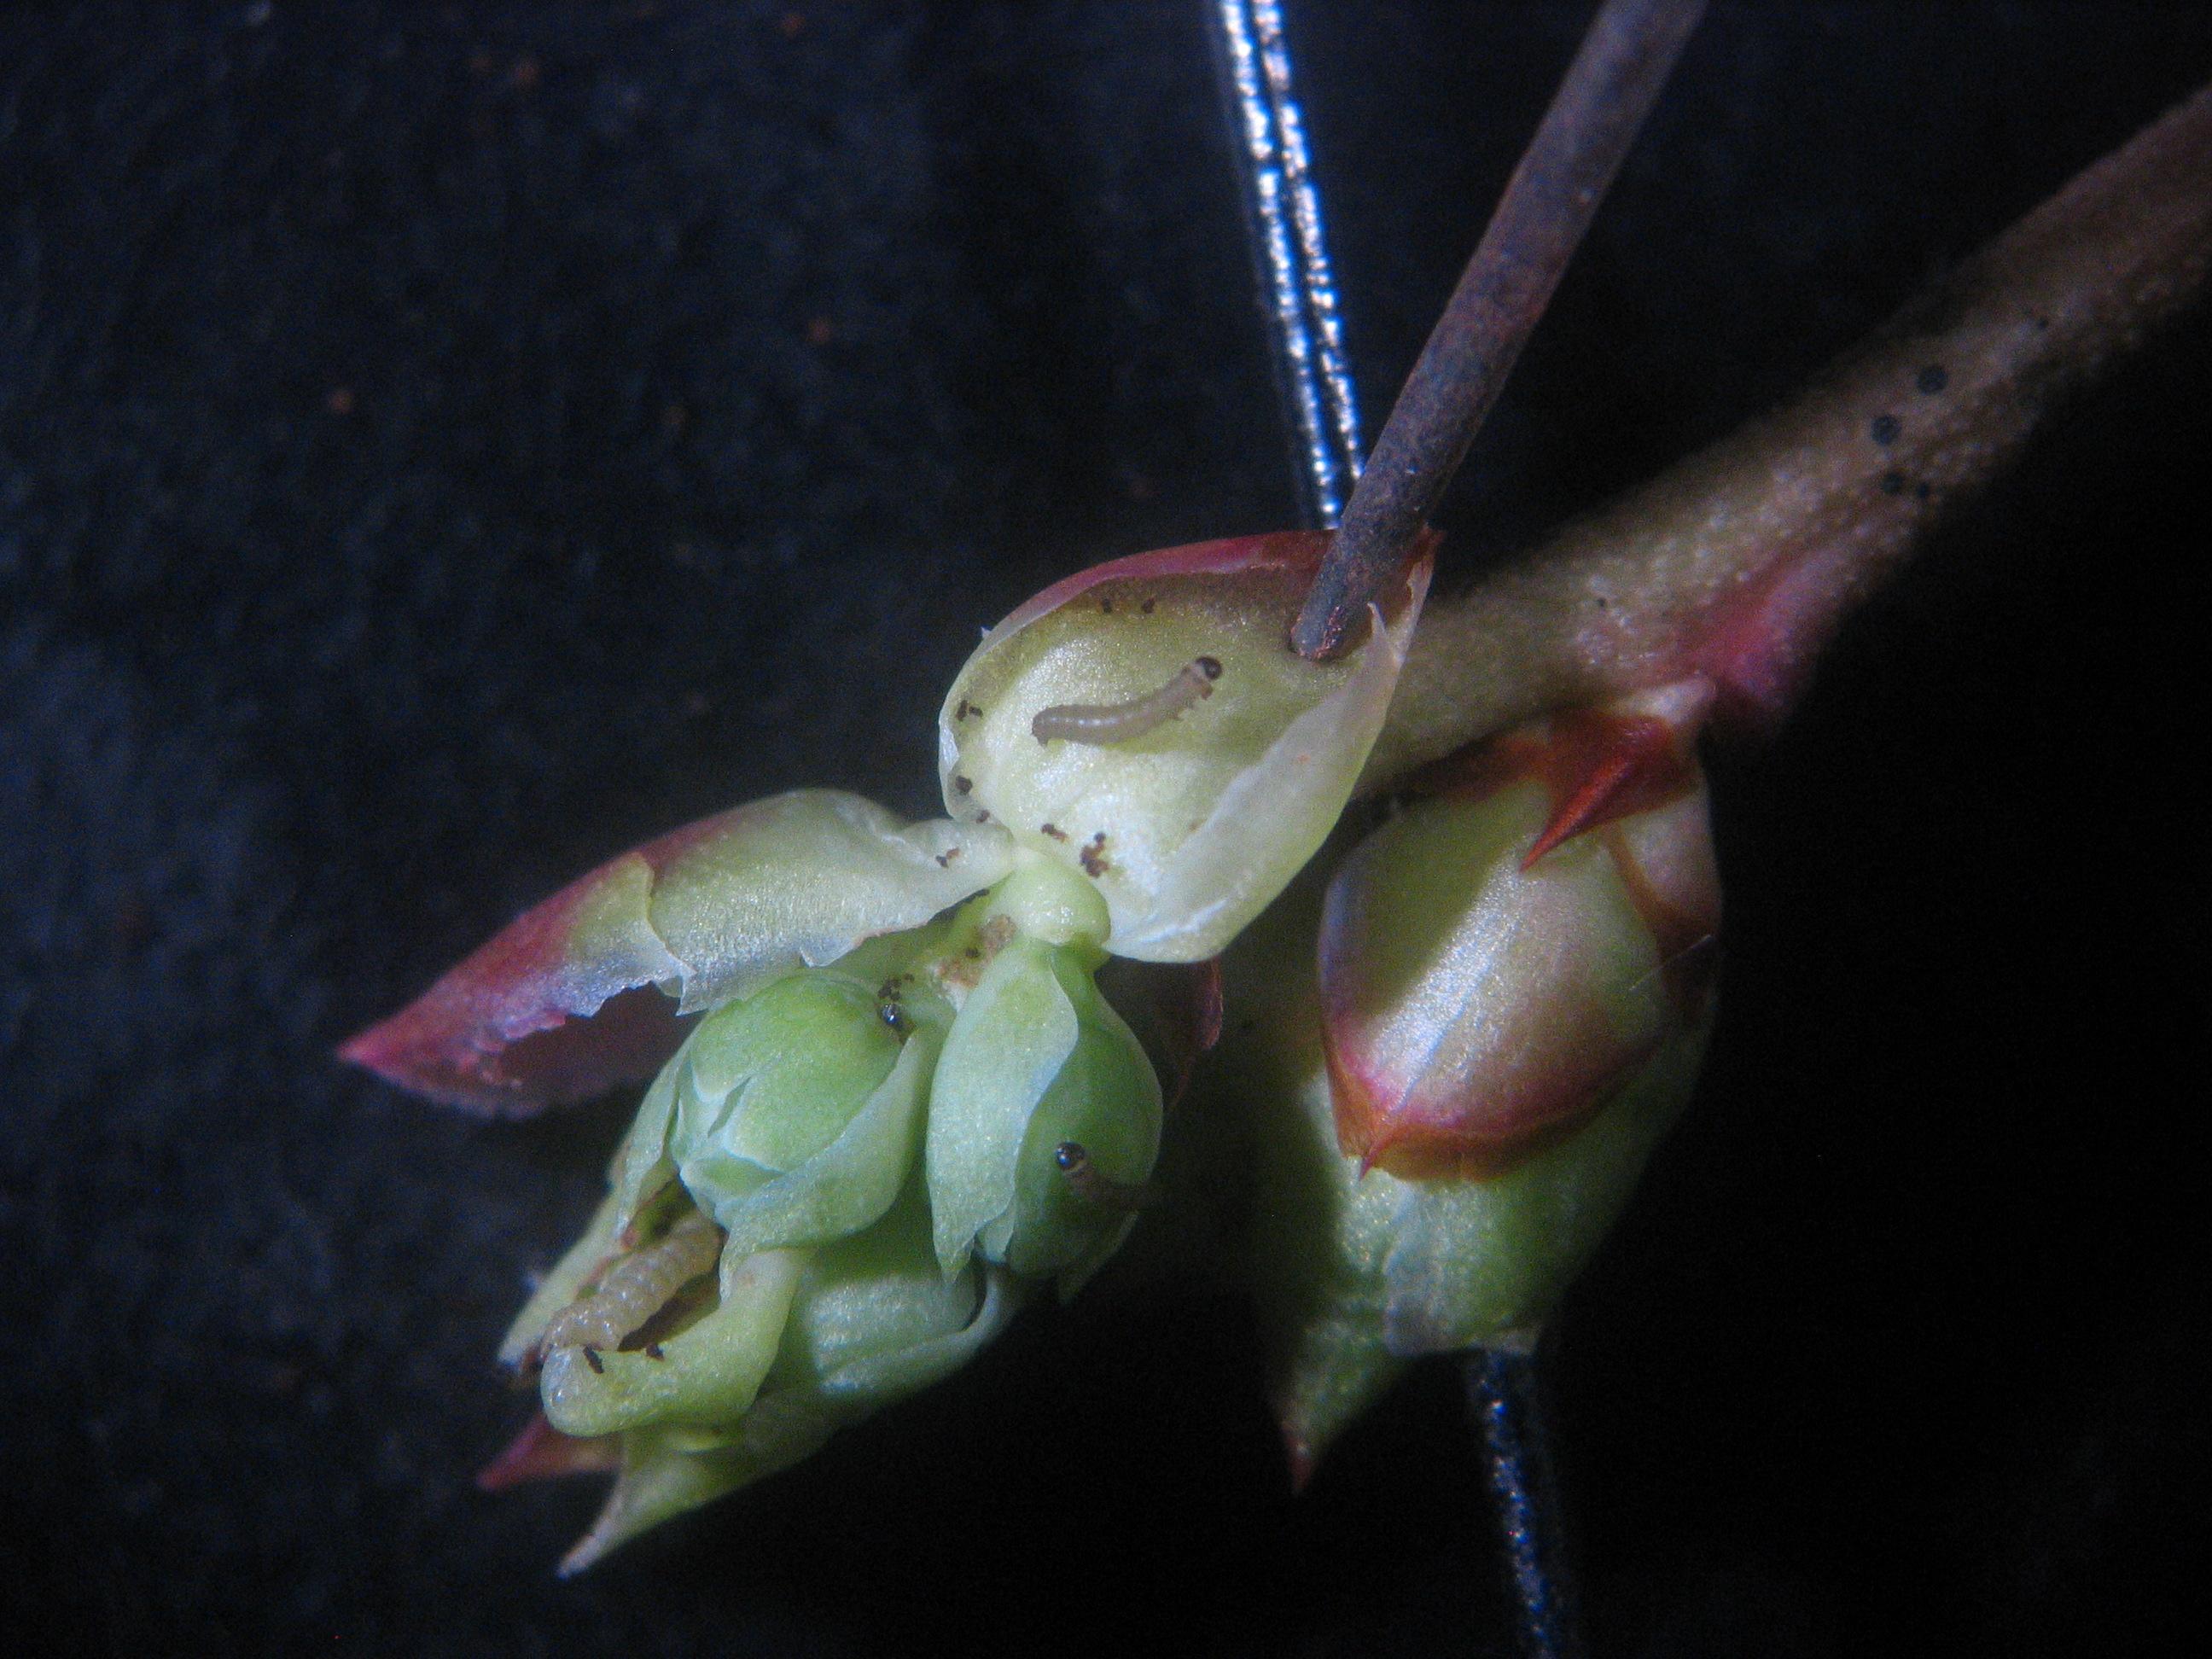 WM caterpillars inside blueberry buds (Photo: H. Faubert, URI)